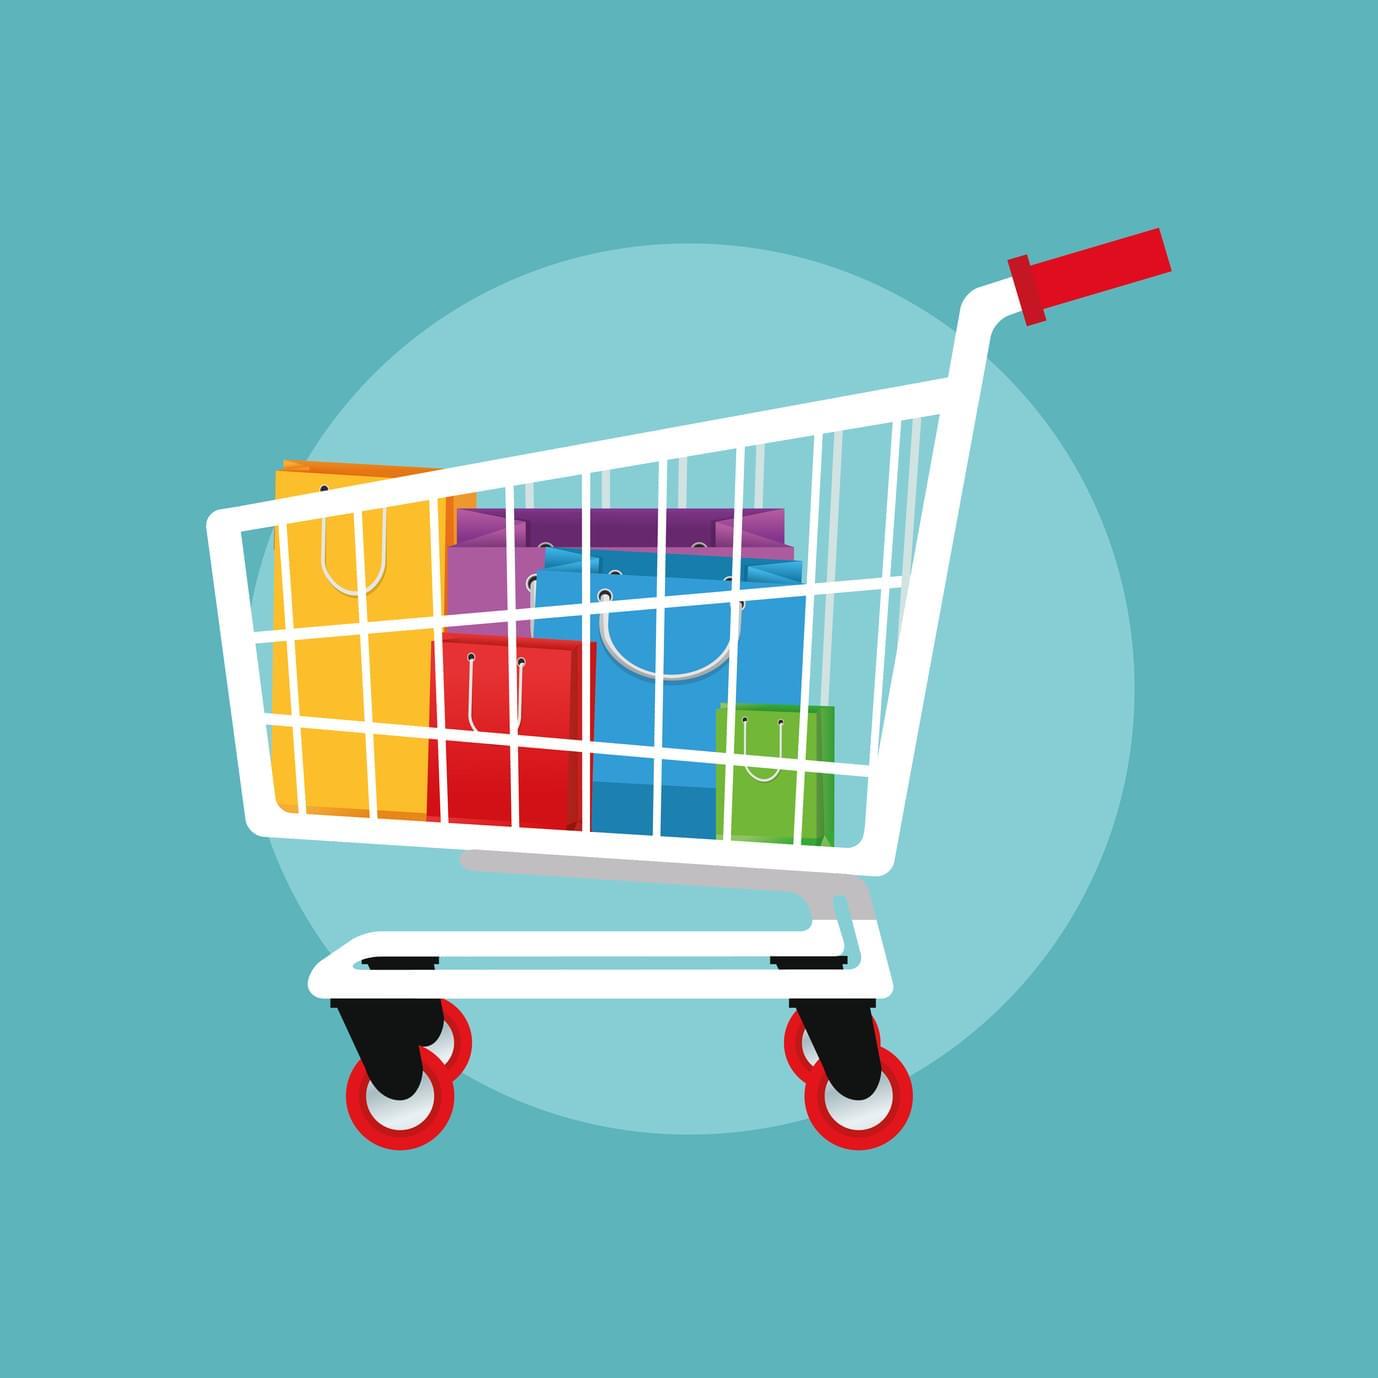 b2c sales email cadence for customer segmentation